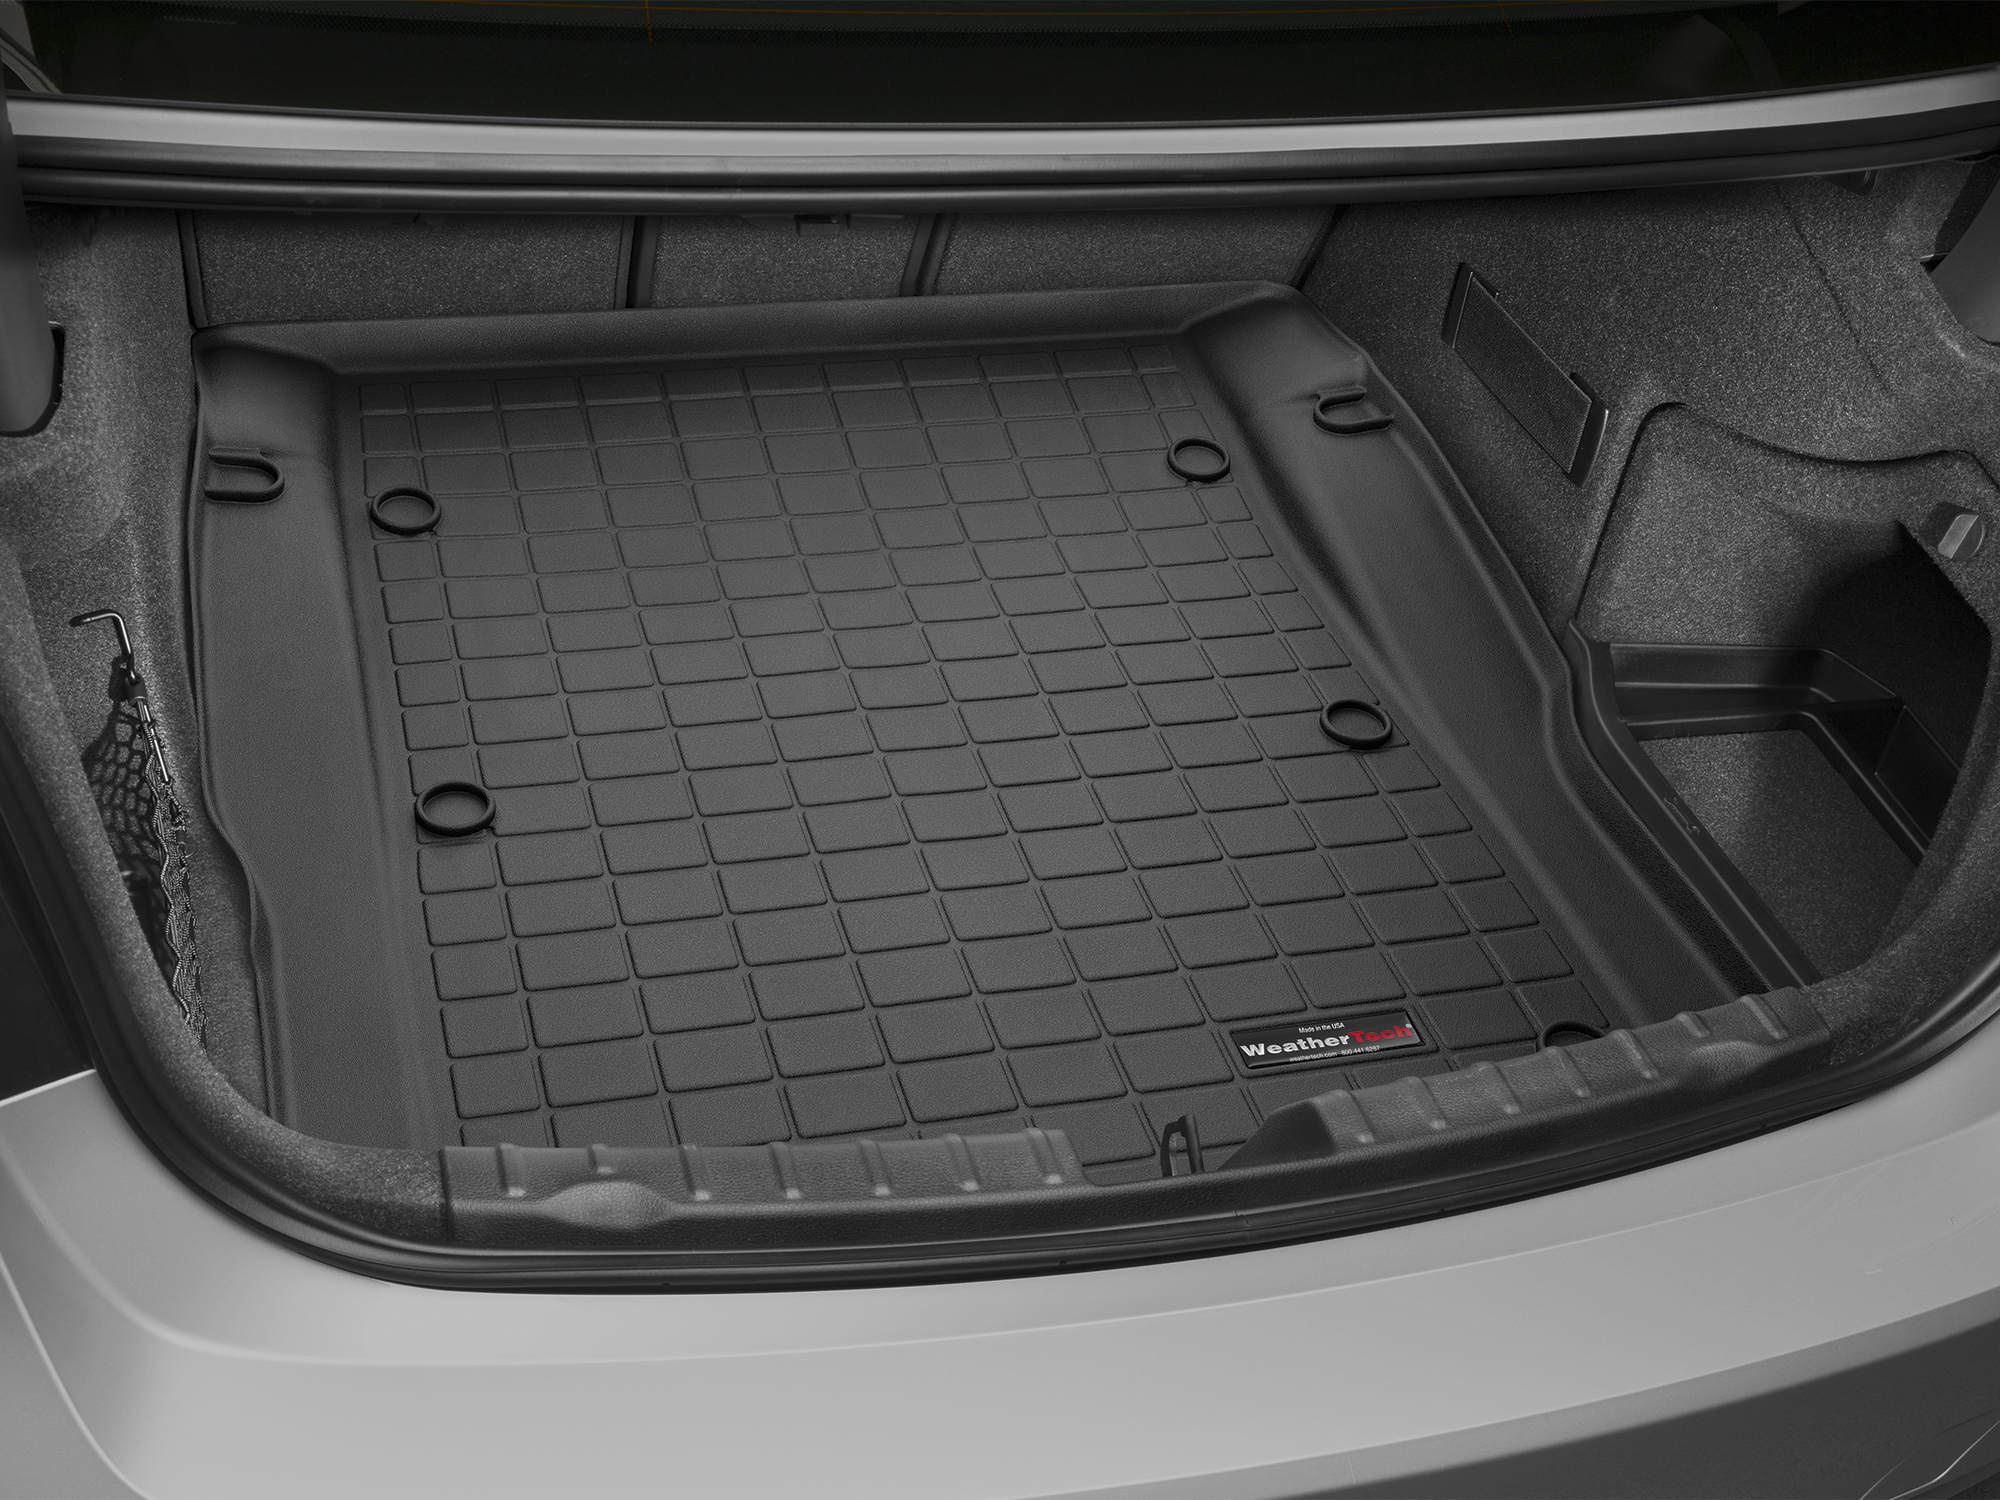 Weathertech floor mats hyundai tucson - 2005 Hyundai Tucson Universal Cargo Mat And Trunk Mat For Cars Suvs And Minivans Weathertecheurope Com En